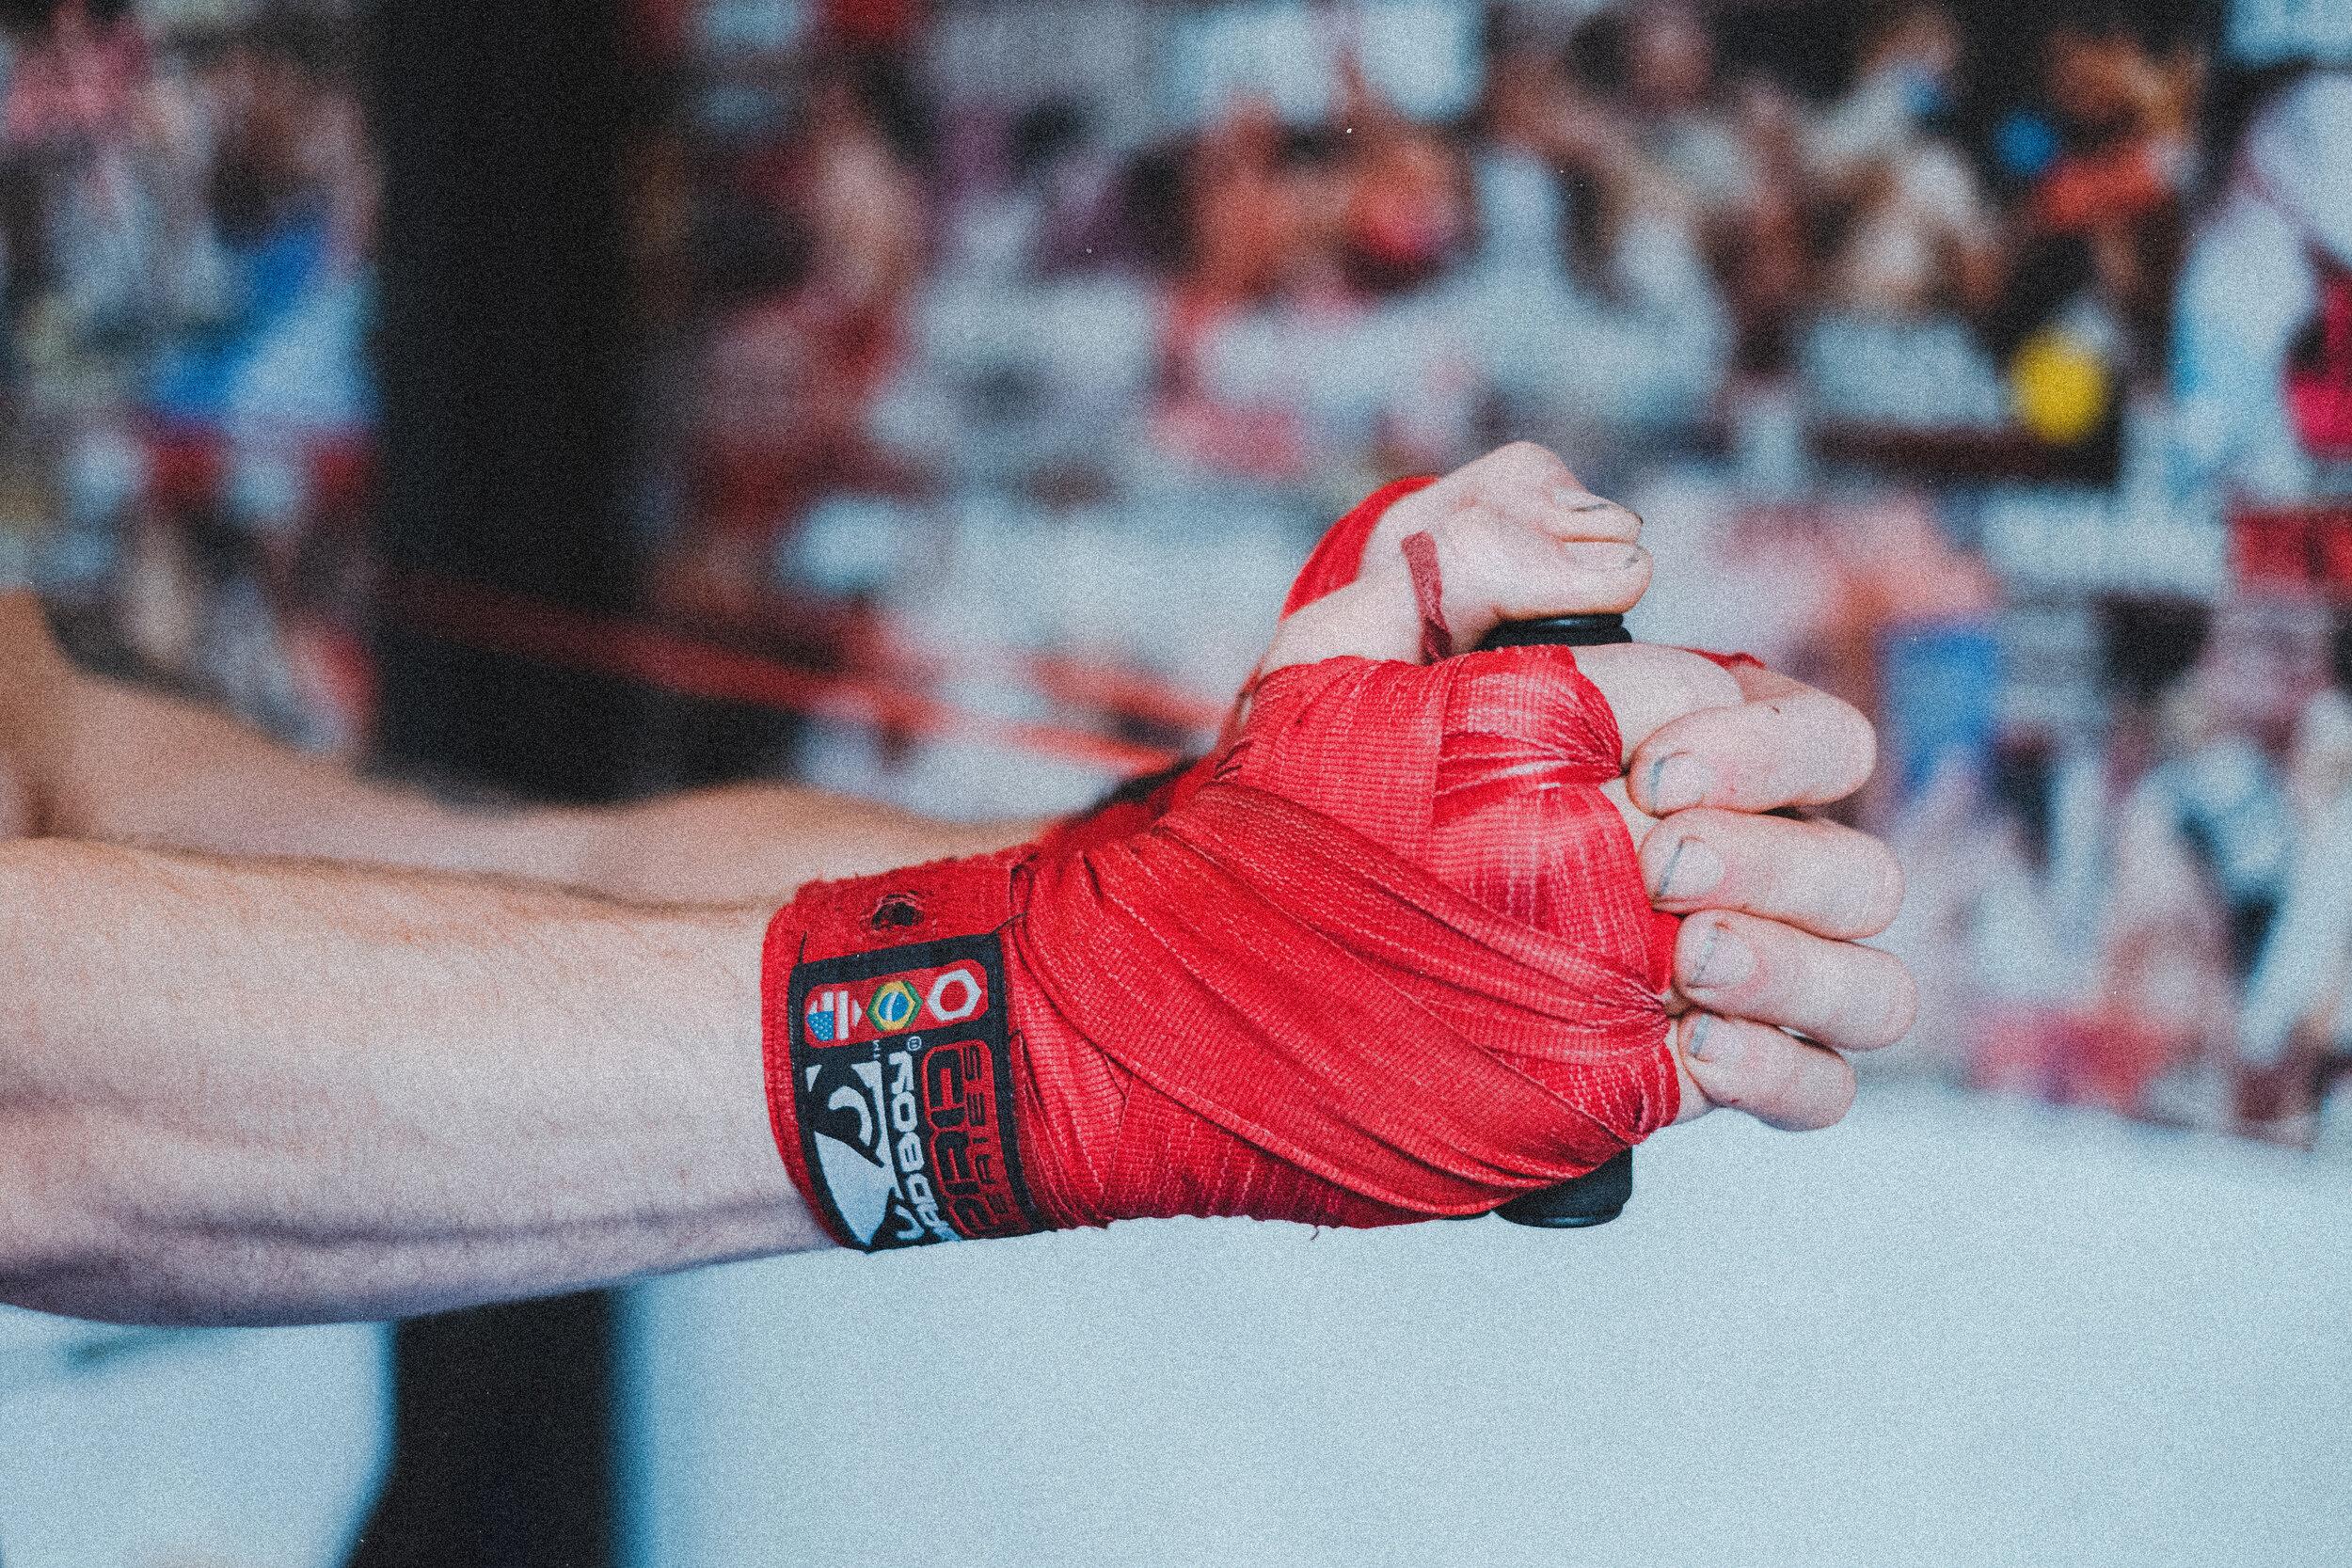 brett boxing session october 2019 (25).jpg